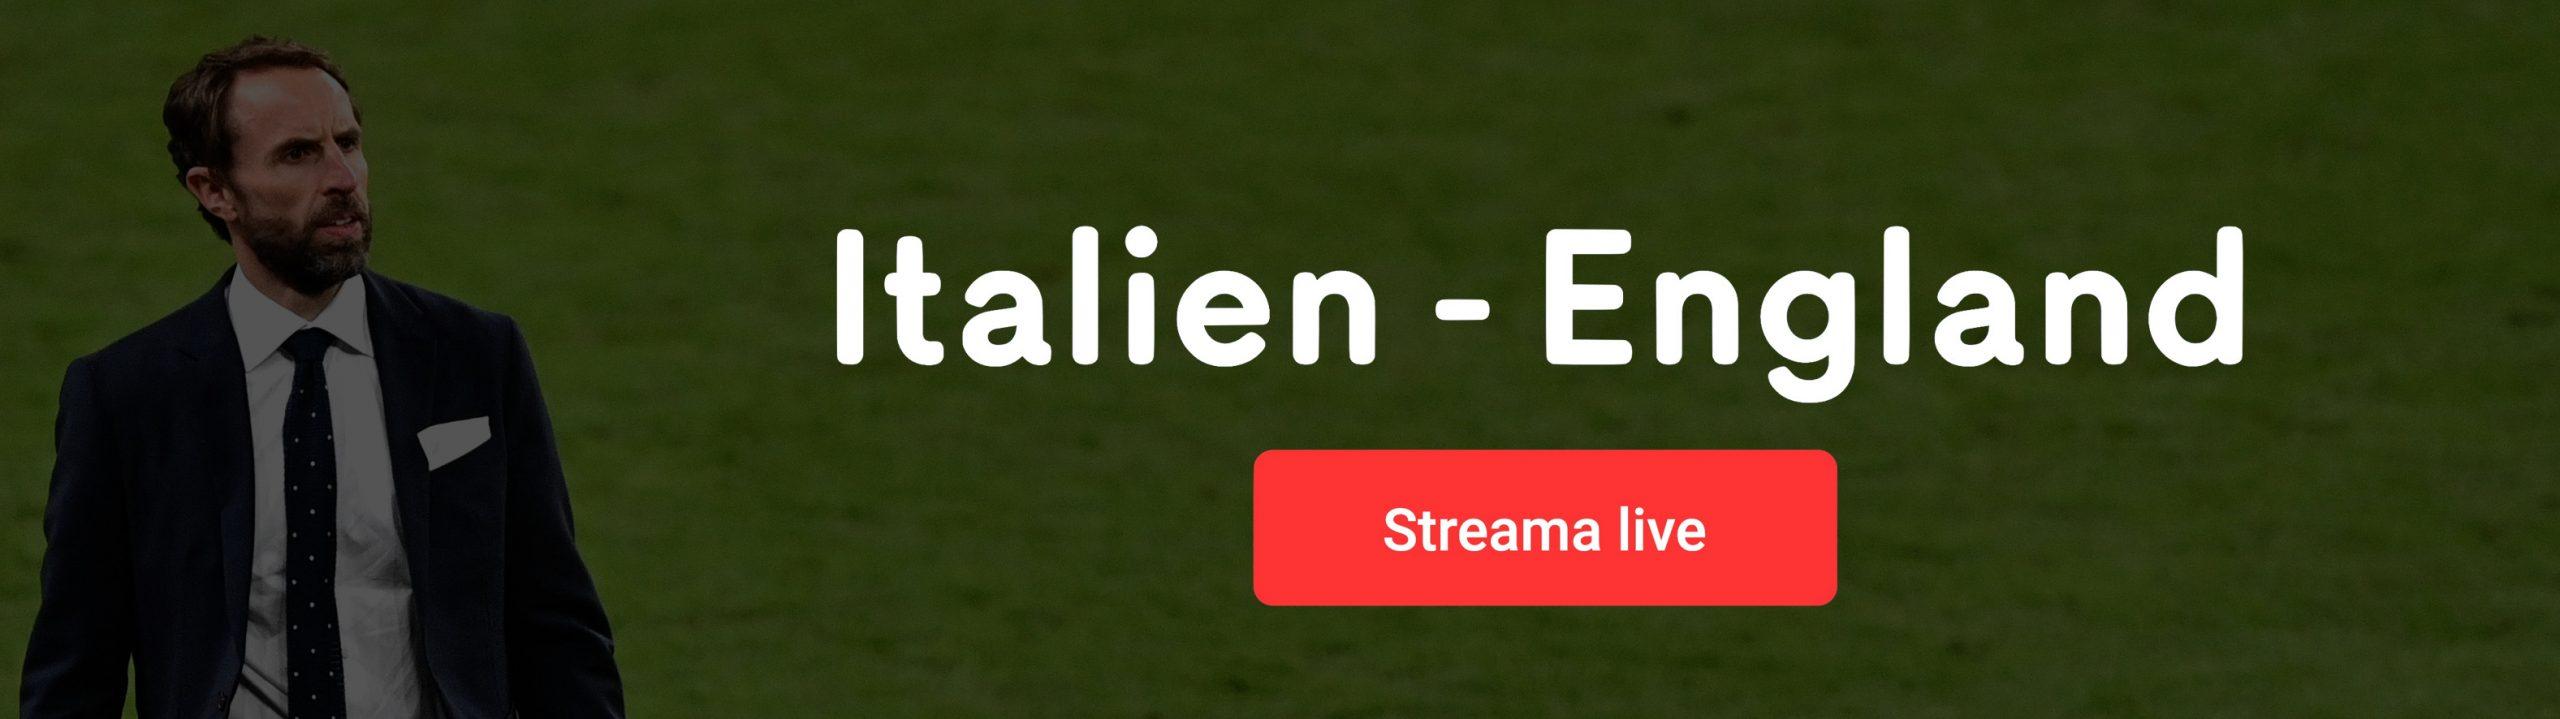 Italien England live stream gratis